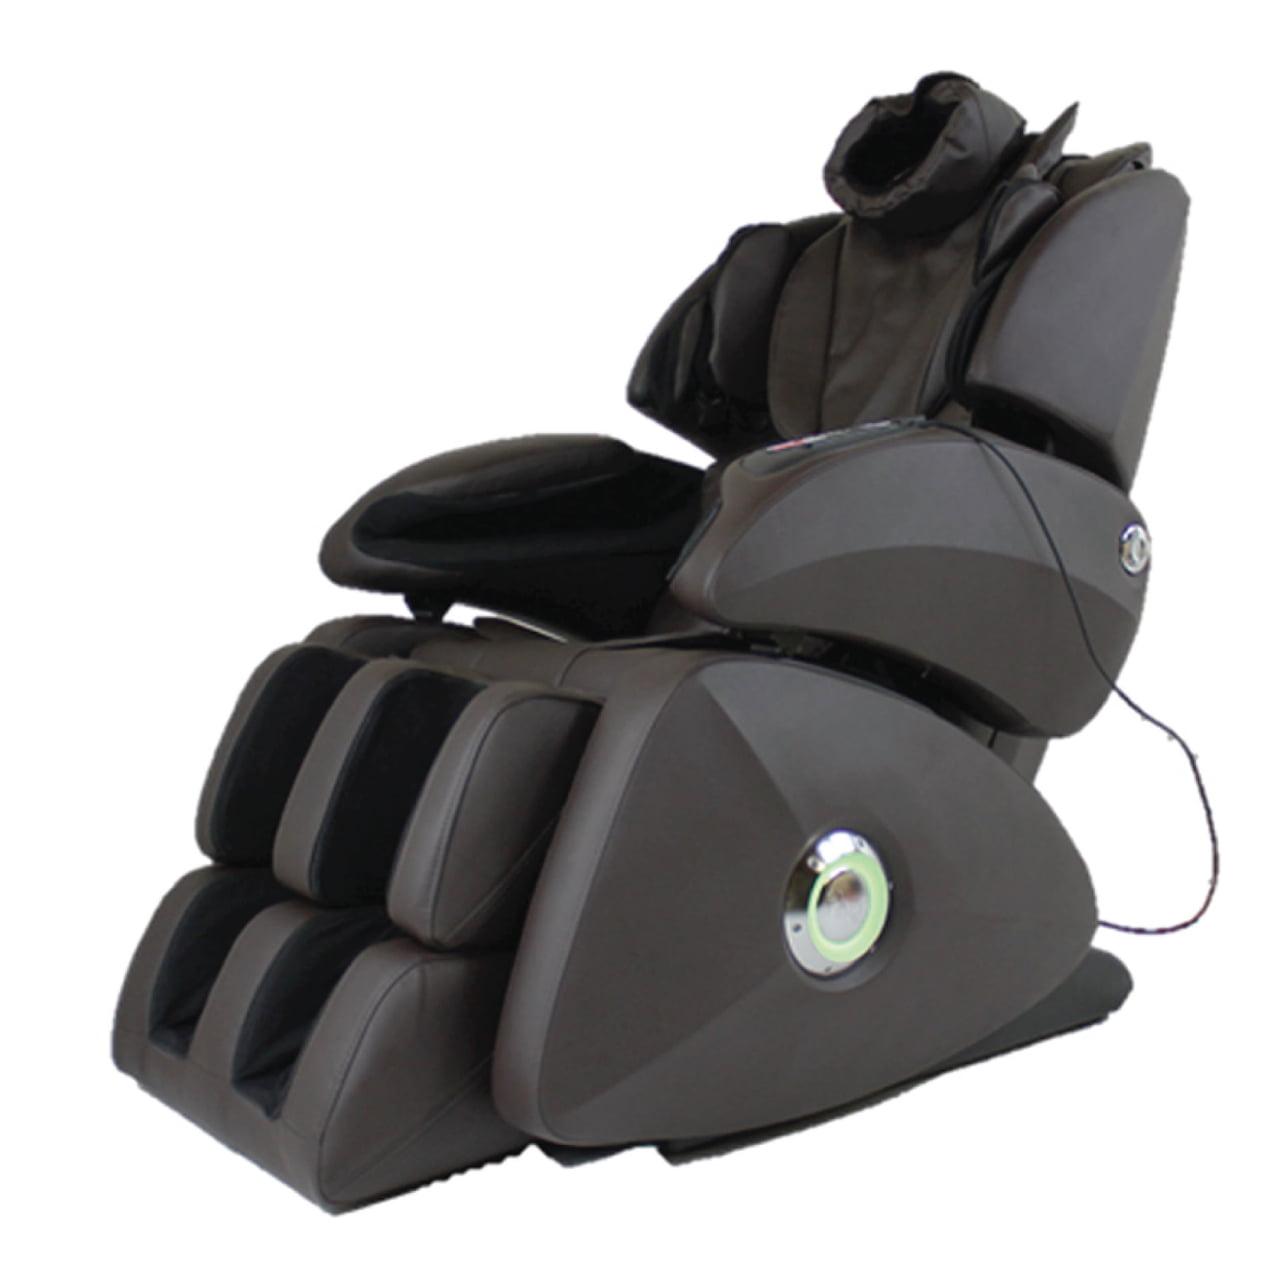 Osaki OS-7075R Massage Chair